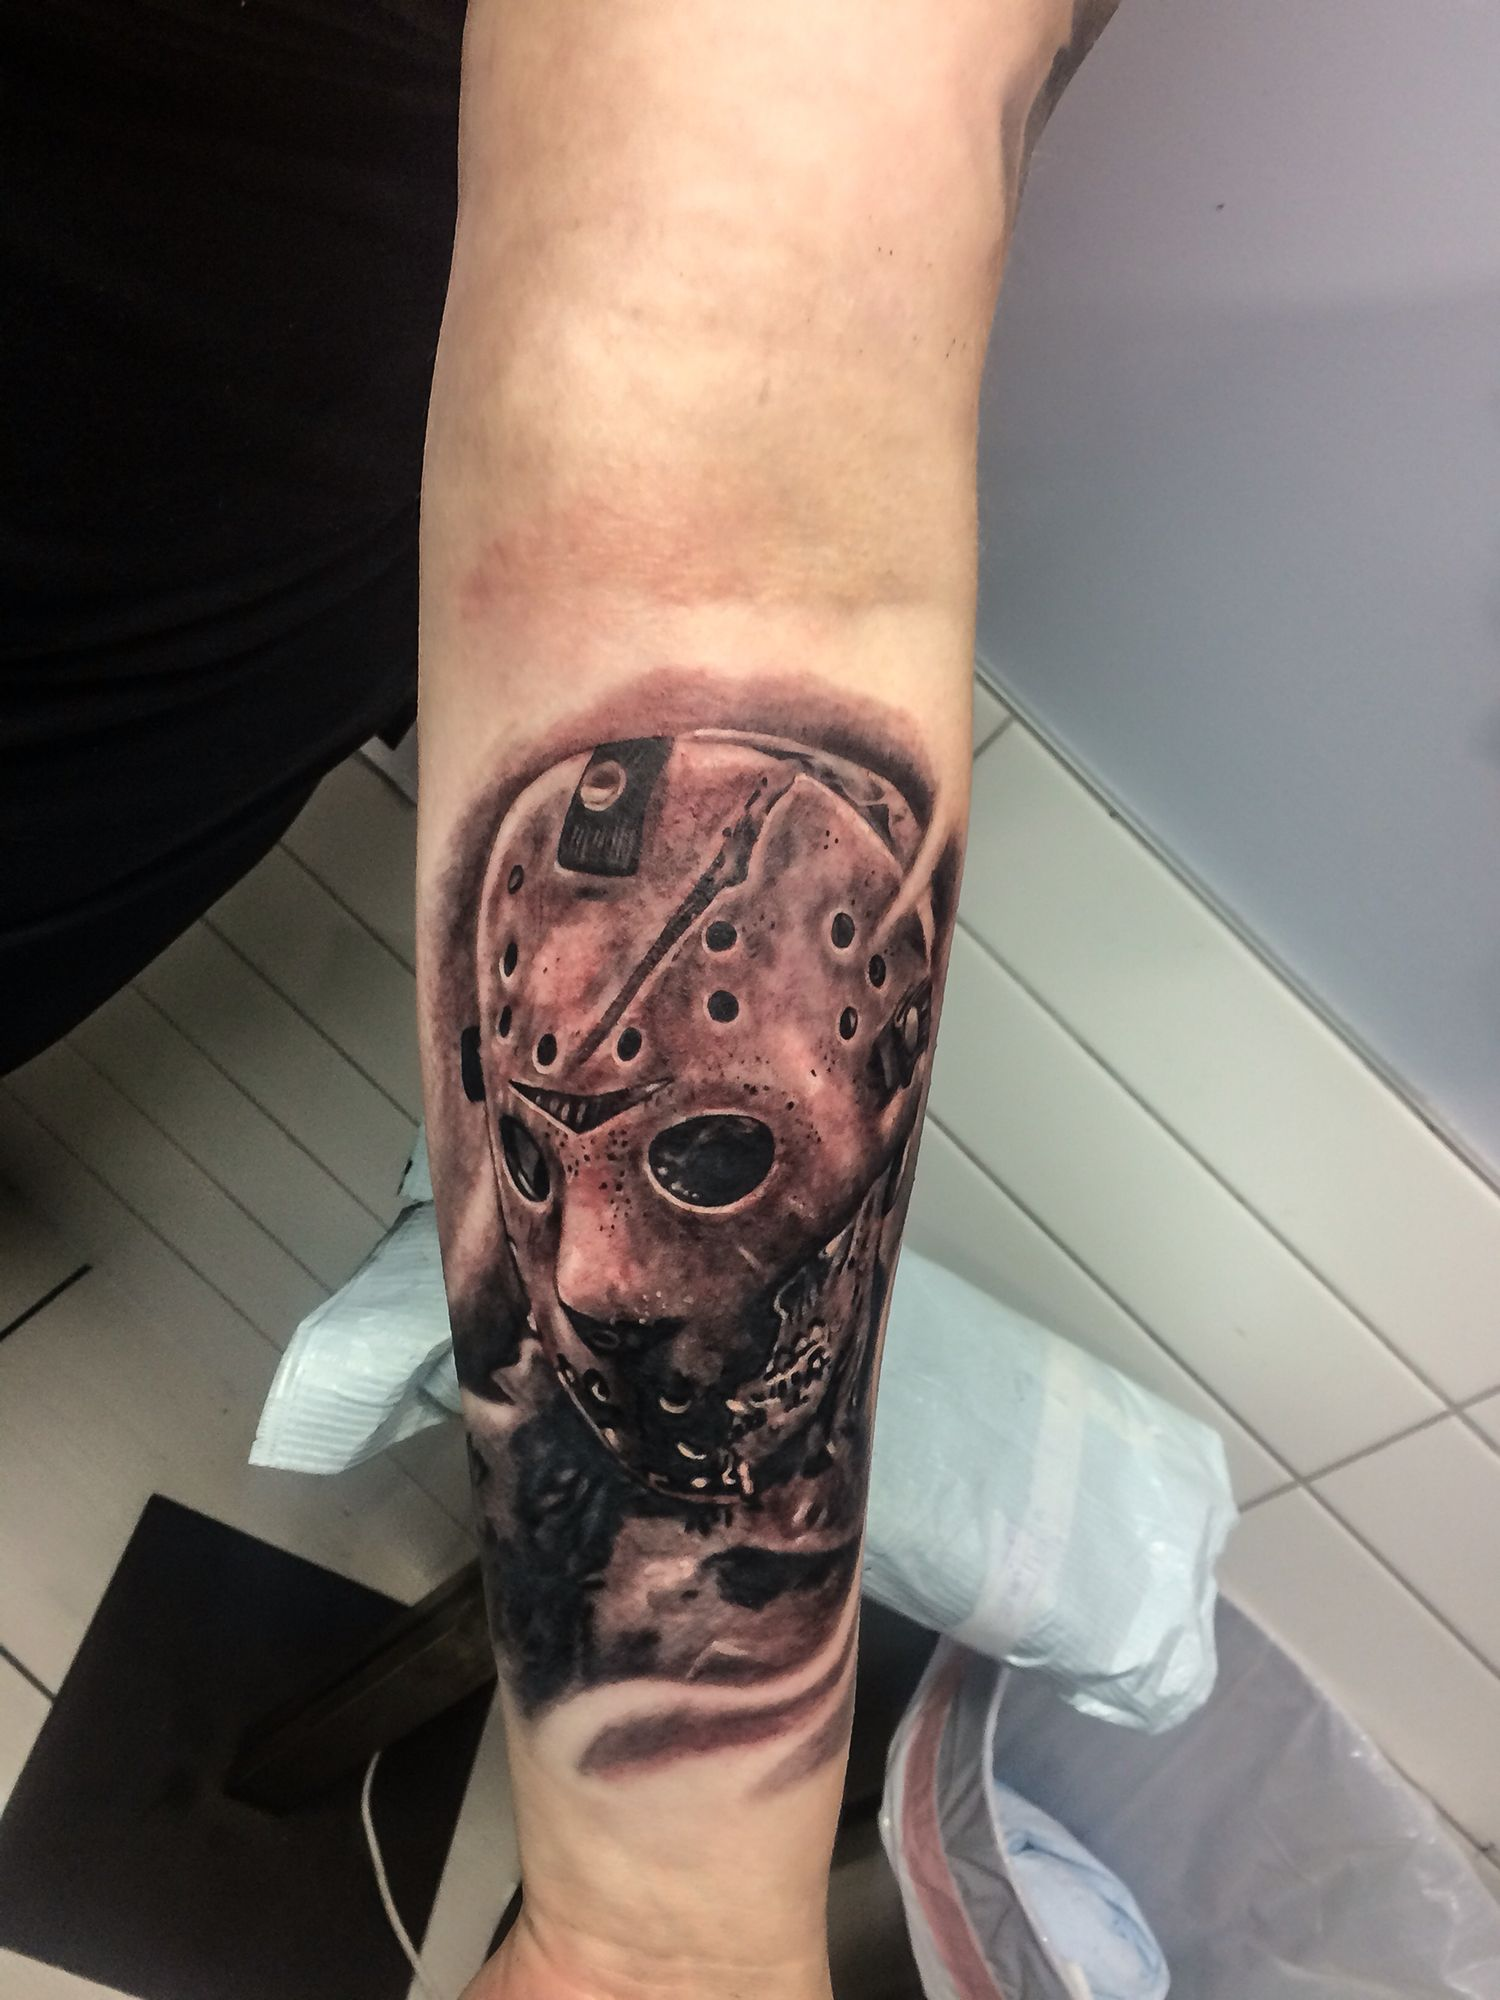 Friday The 13th Friday The 13th Tattoo 13 Tattoos Tattoos